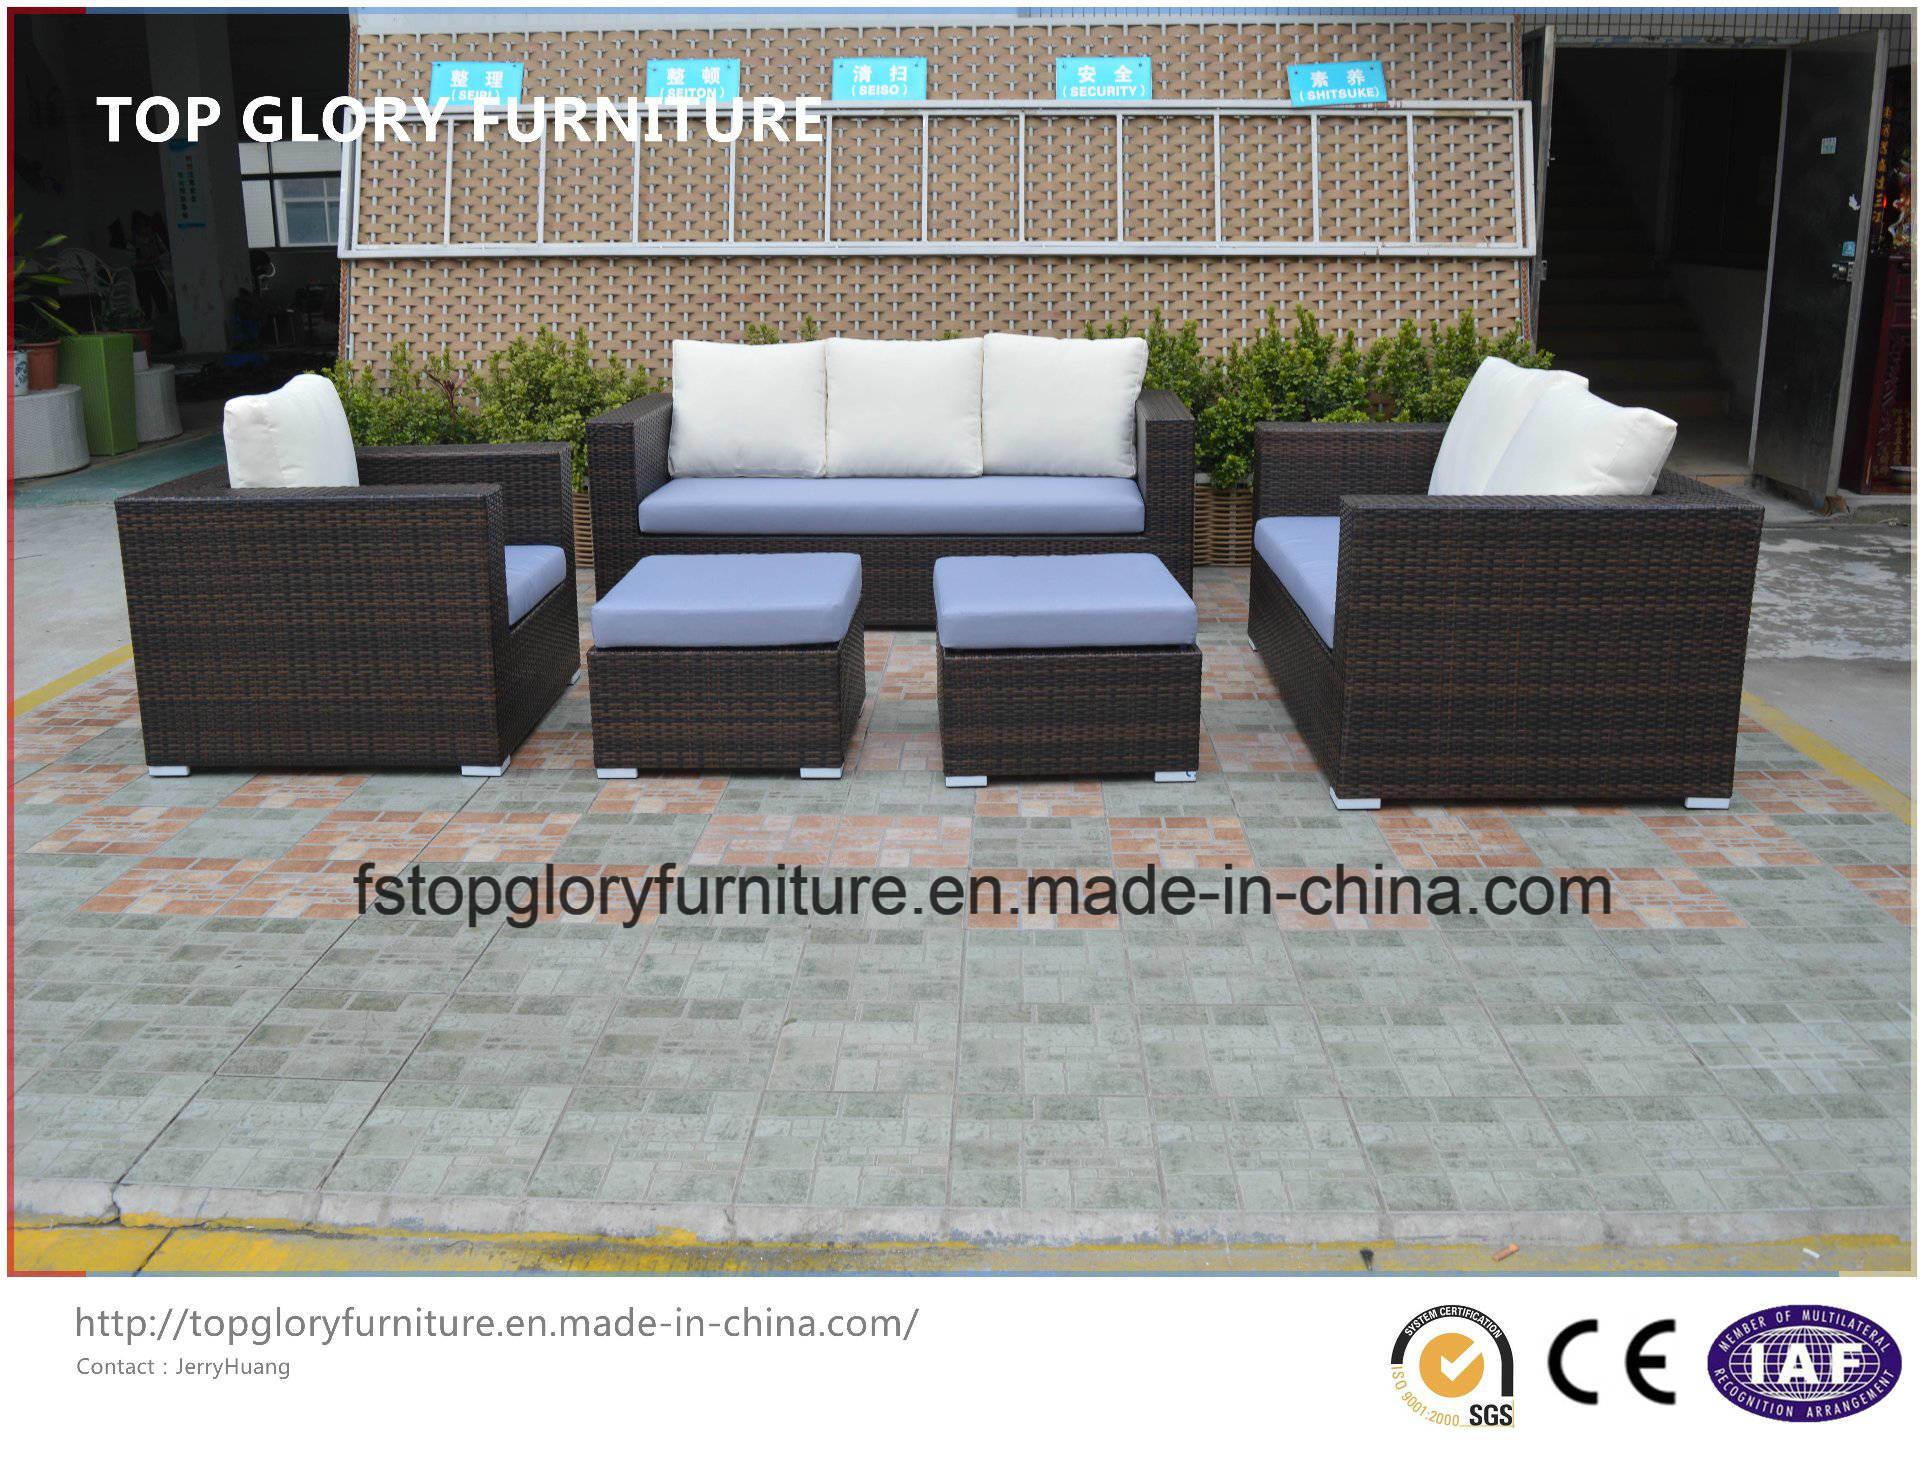 Modern Garden Furniture Wicker/Rattan Sofa (TG-7001)